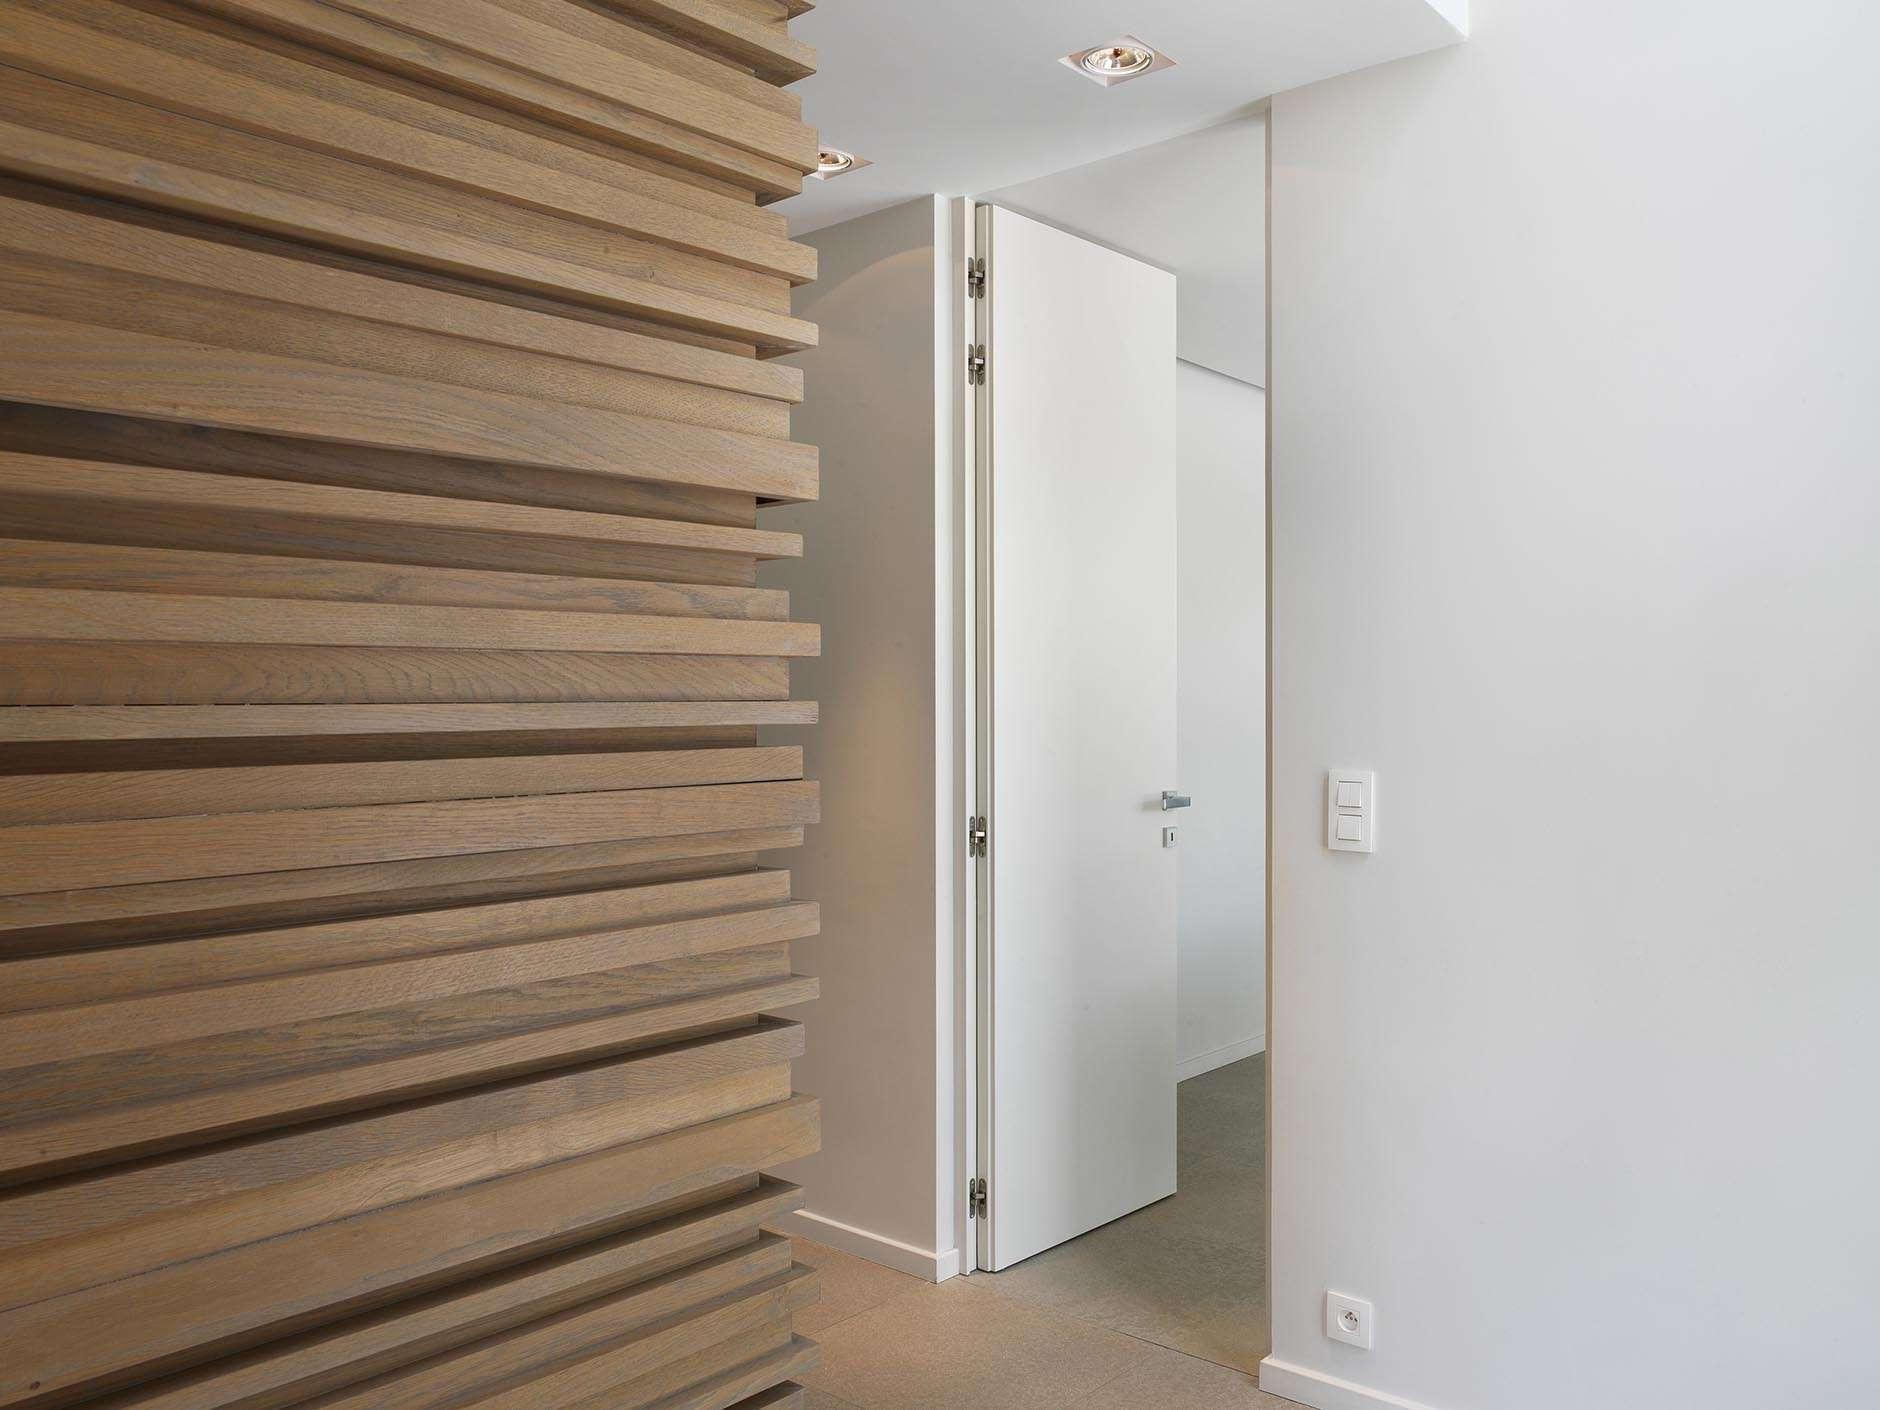 plafondhoge-binnendeur-wit-gelakt